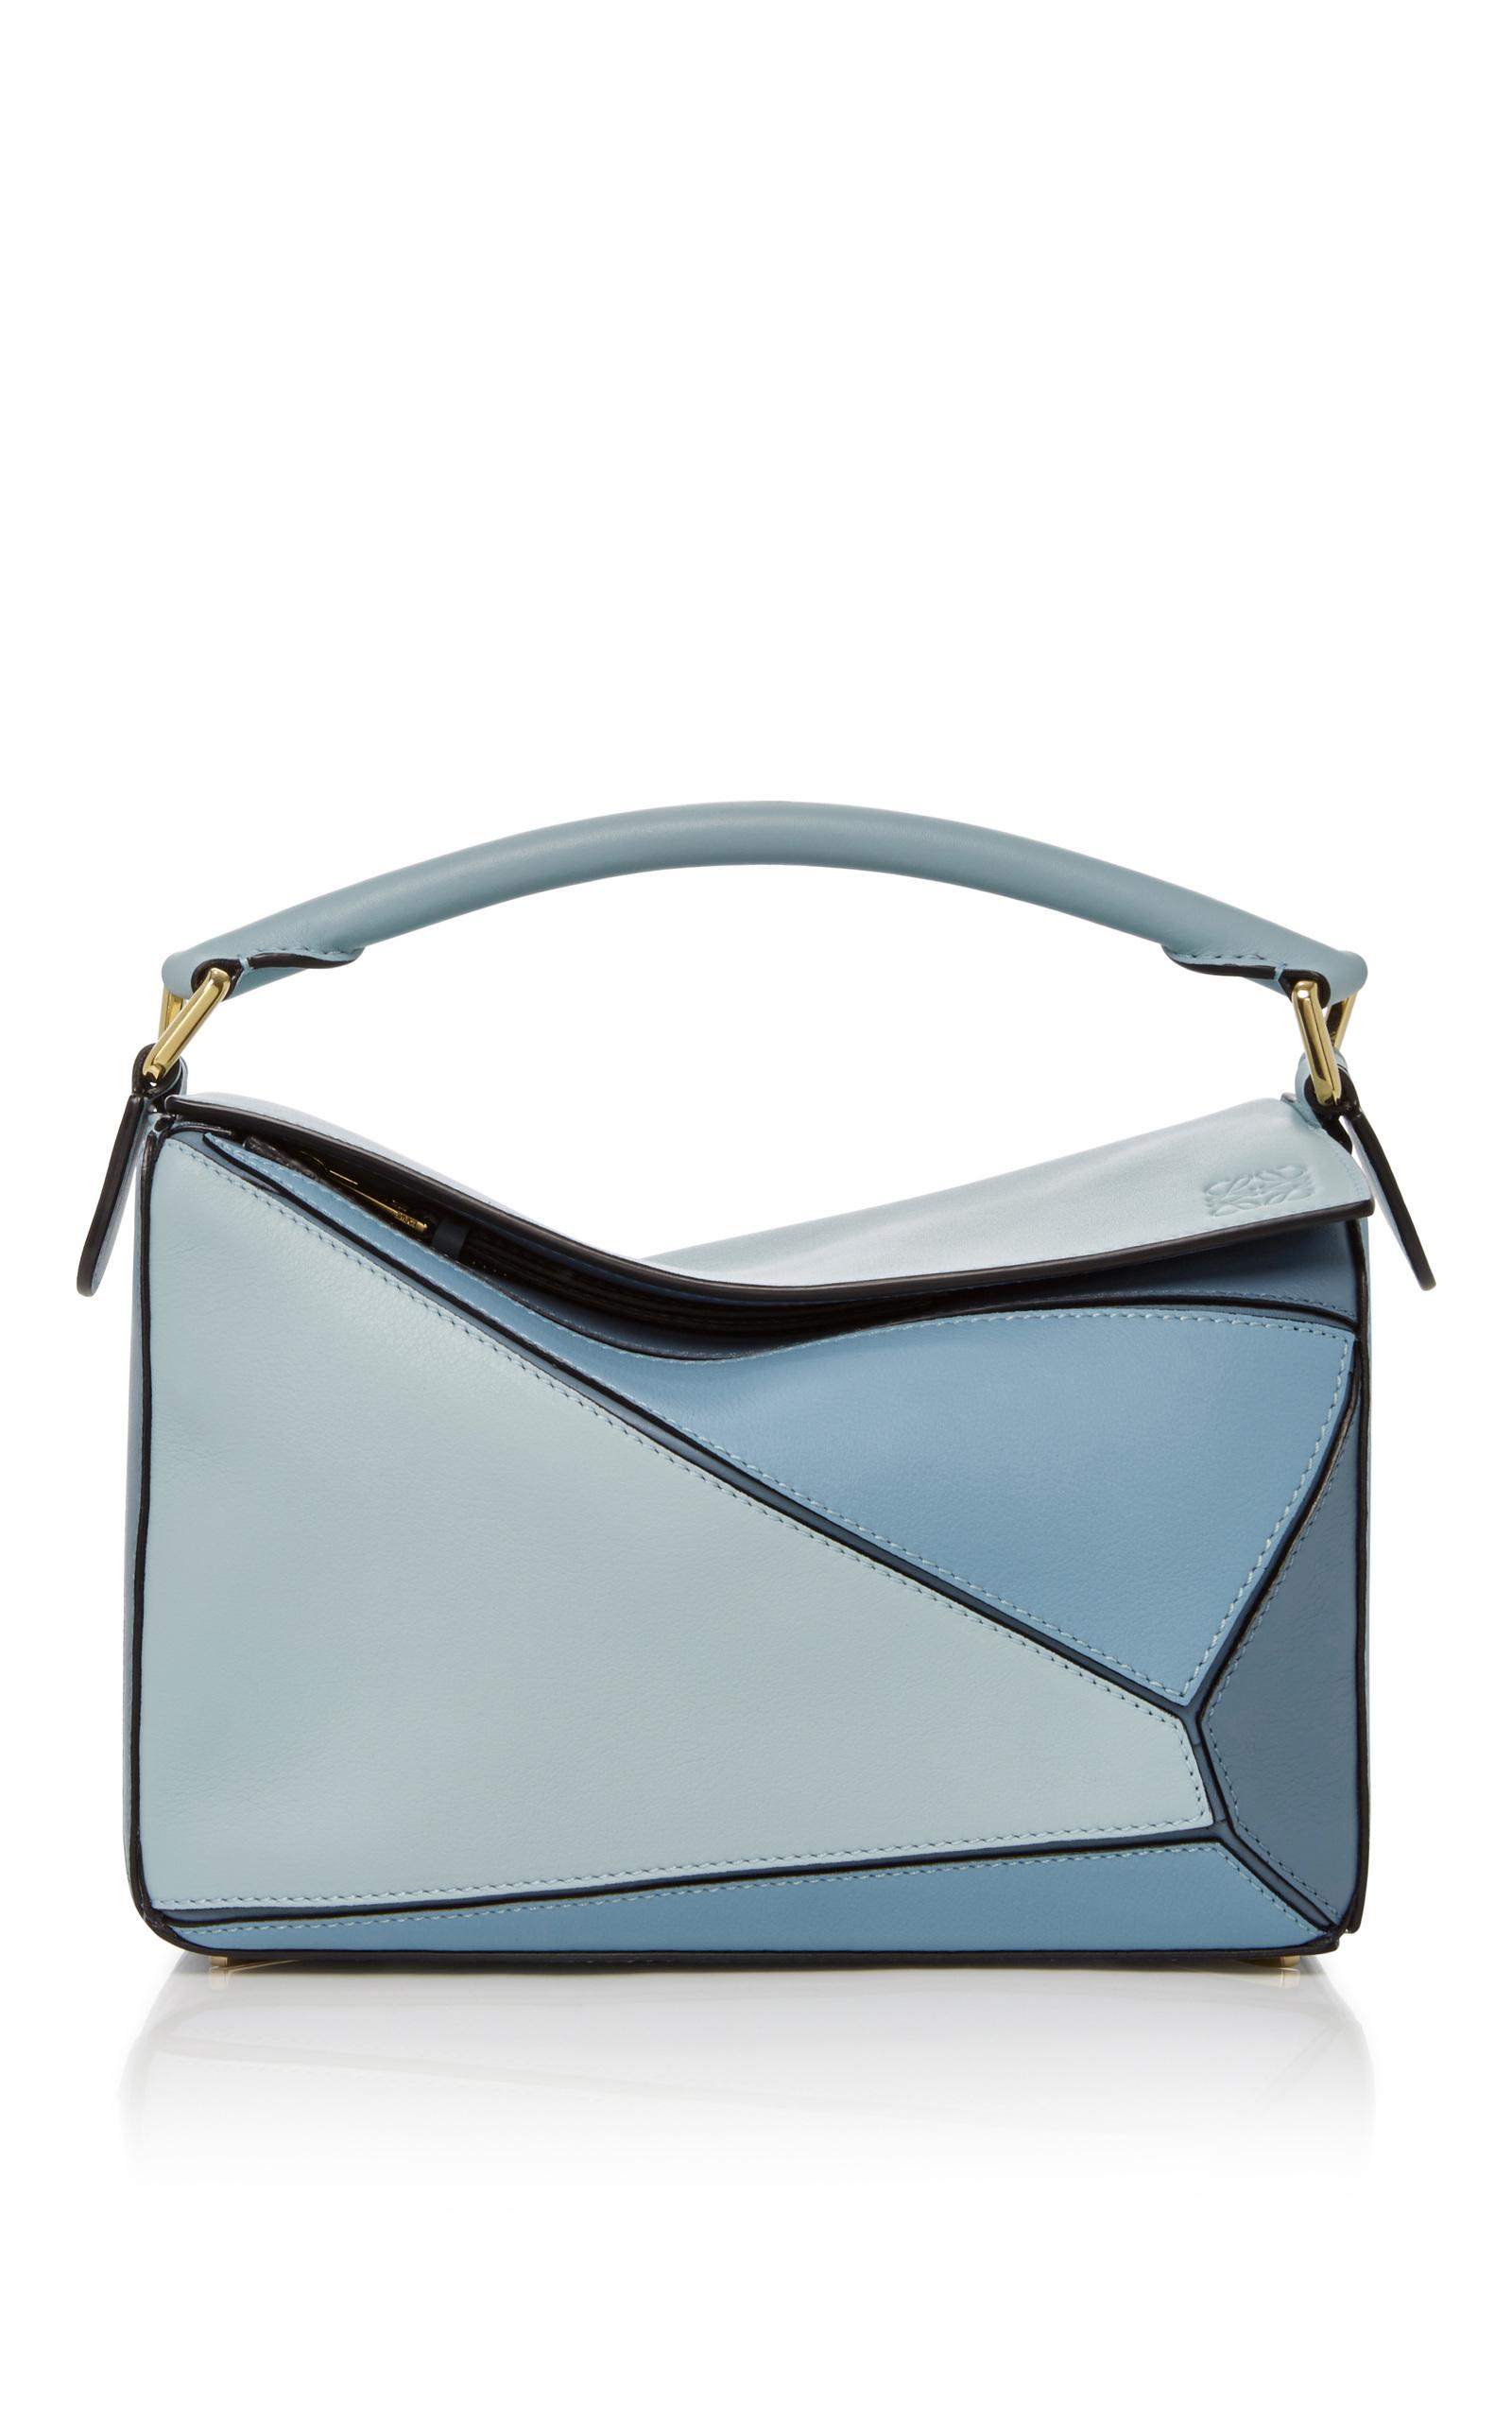 Mini Puzzle Calfskin Leather Crossbody Bag - Blue, Aqua / Light Blue / Stone Blue